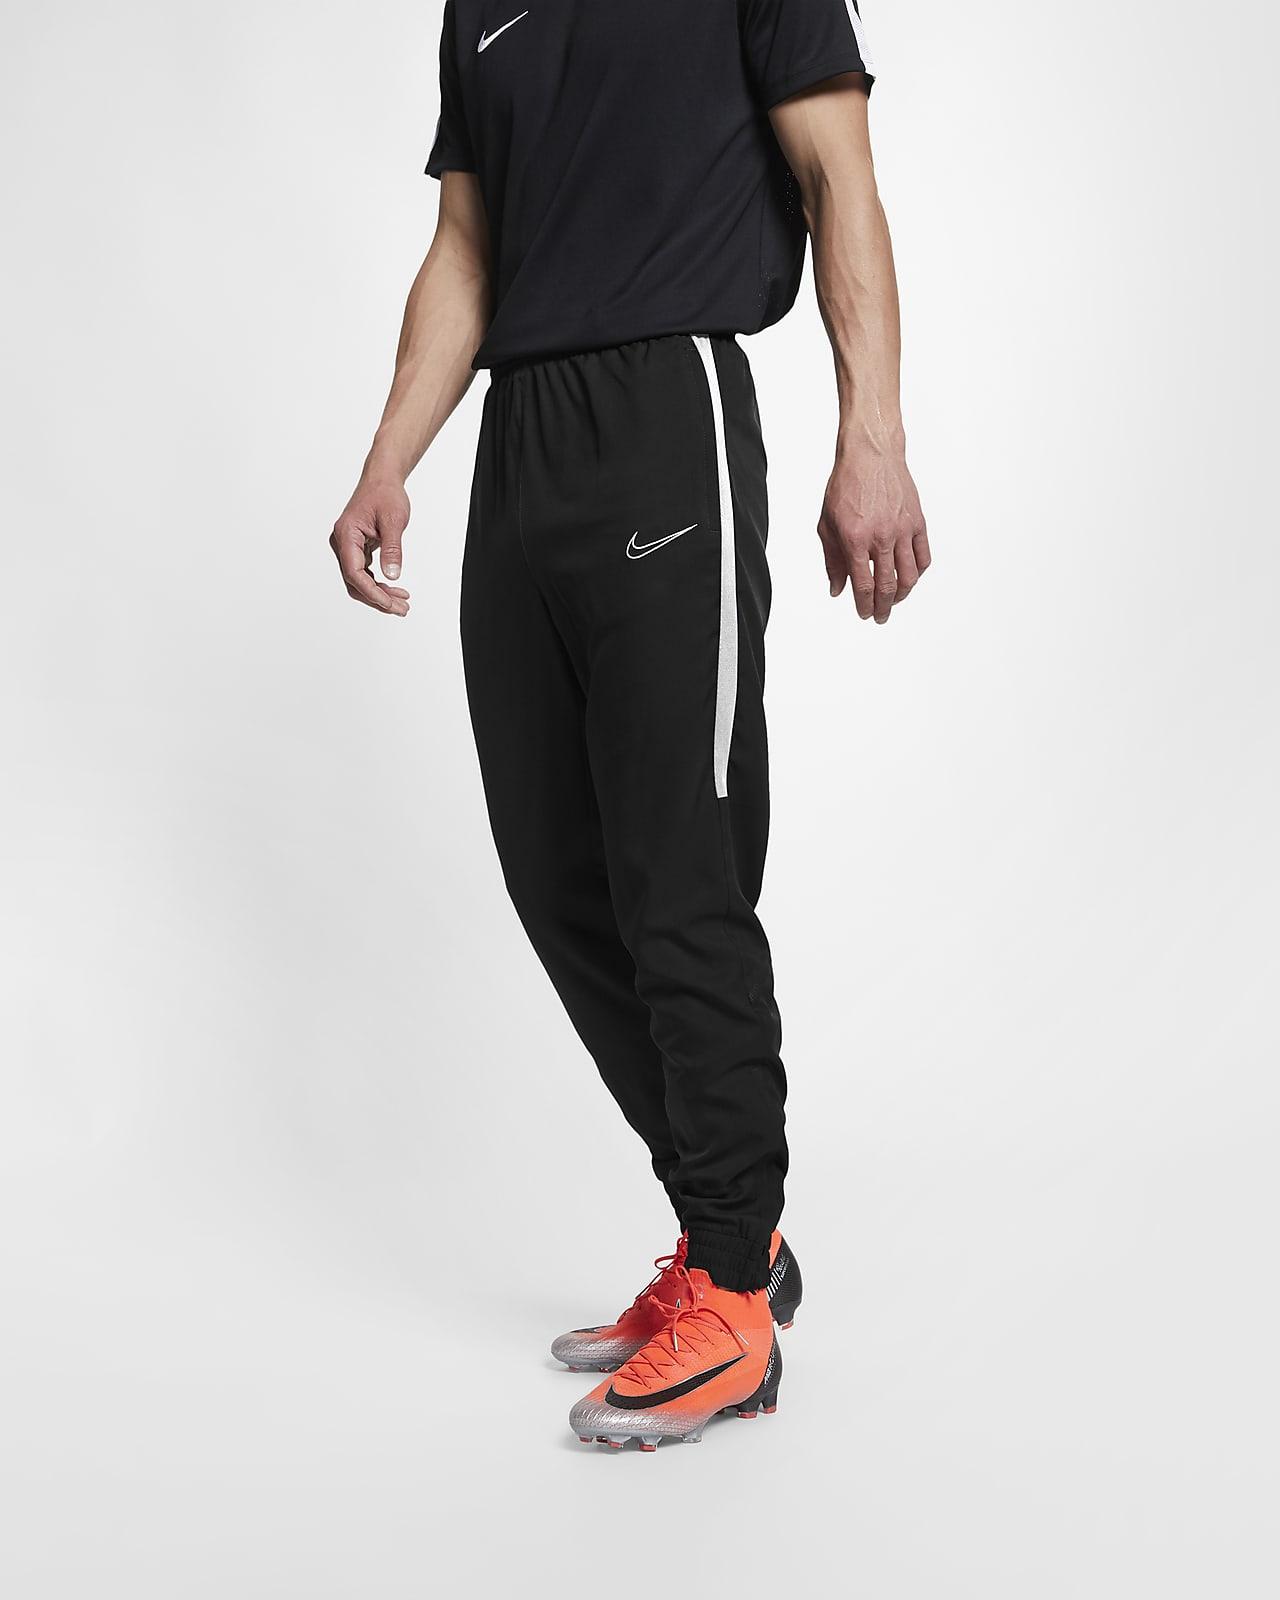 Nike Dri-FIT Academy Men's Football Pants